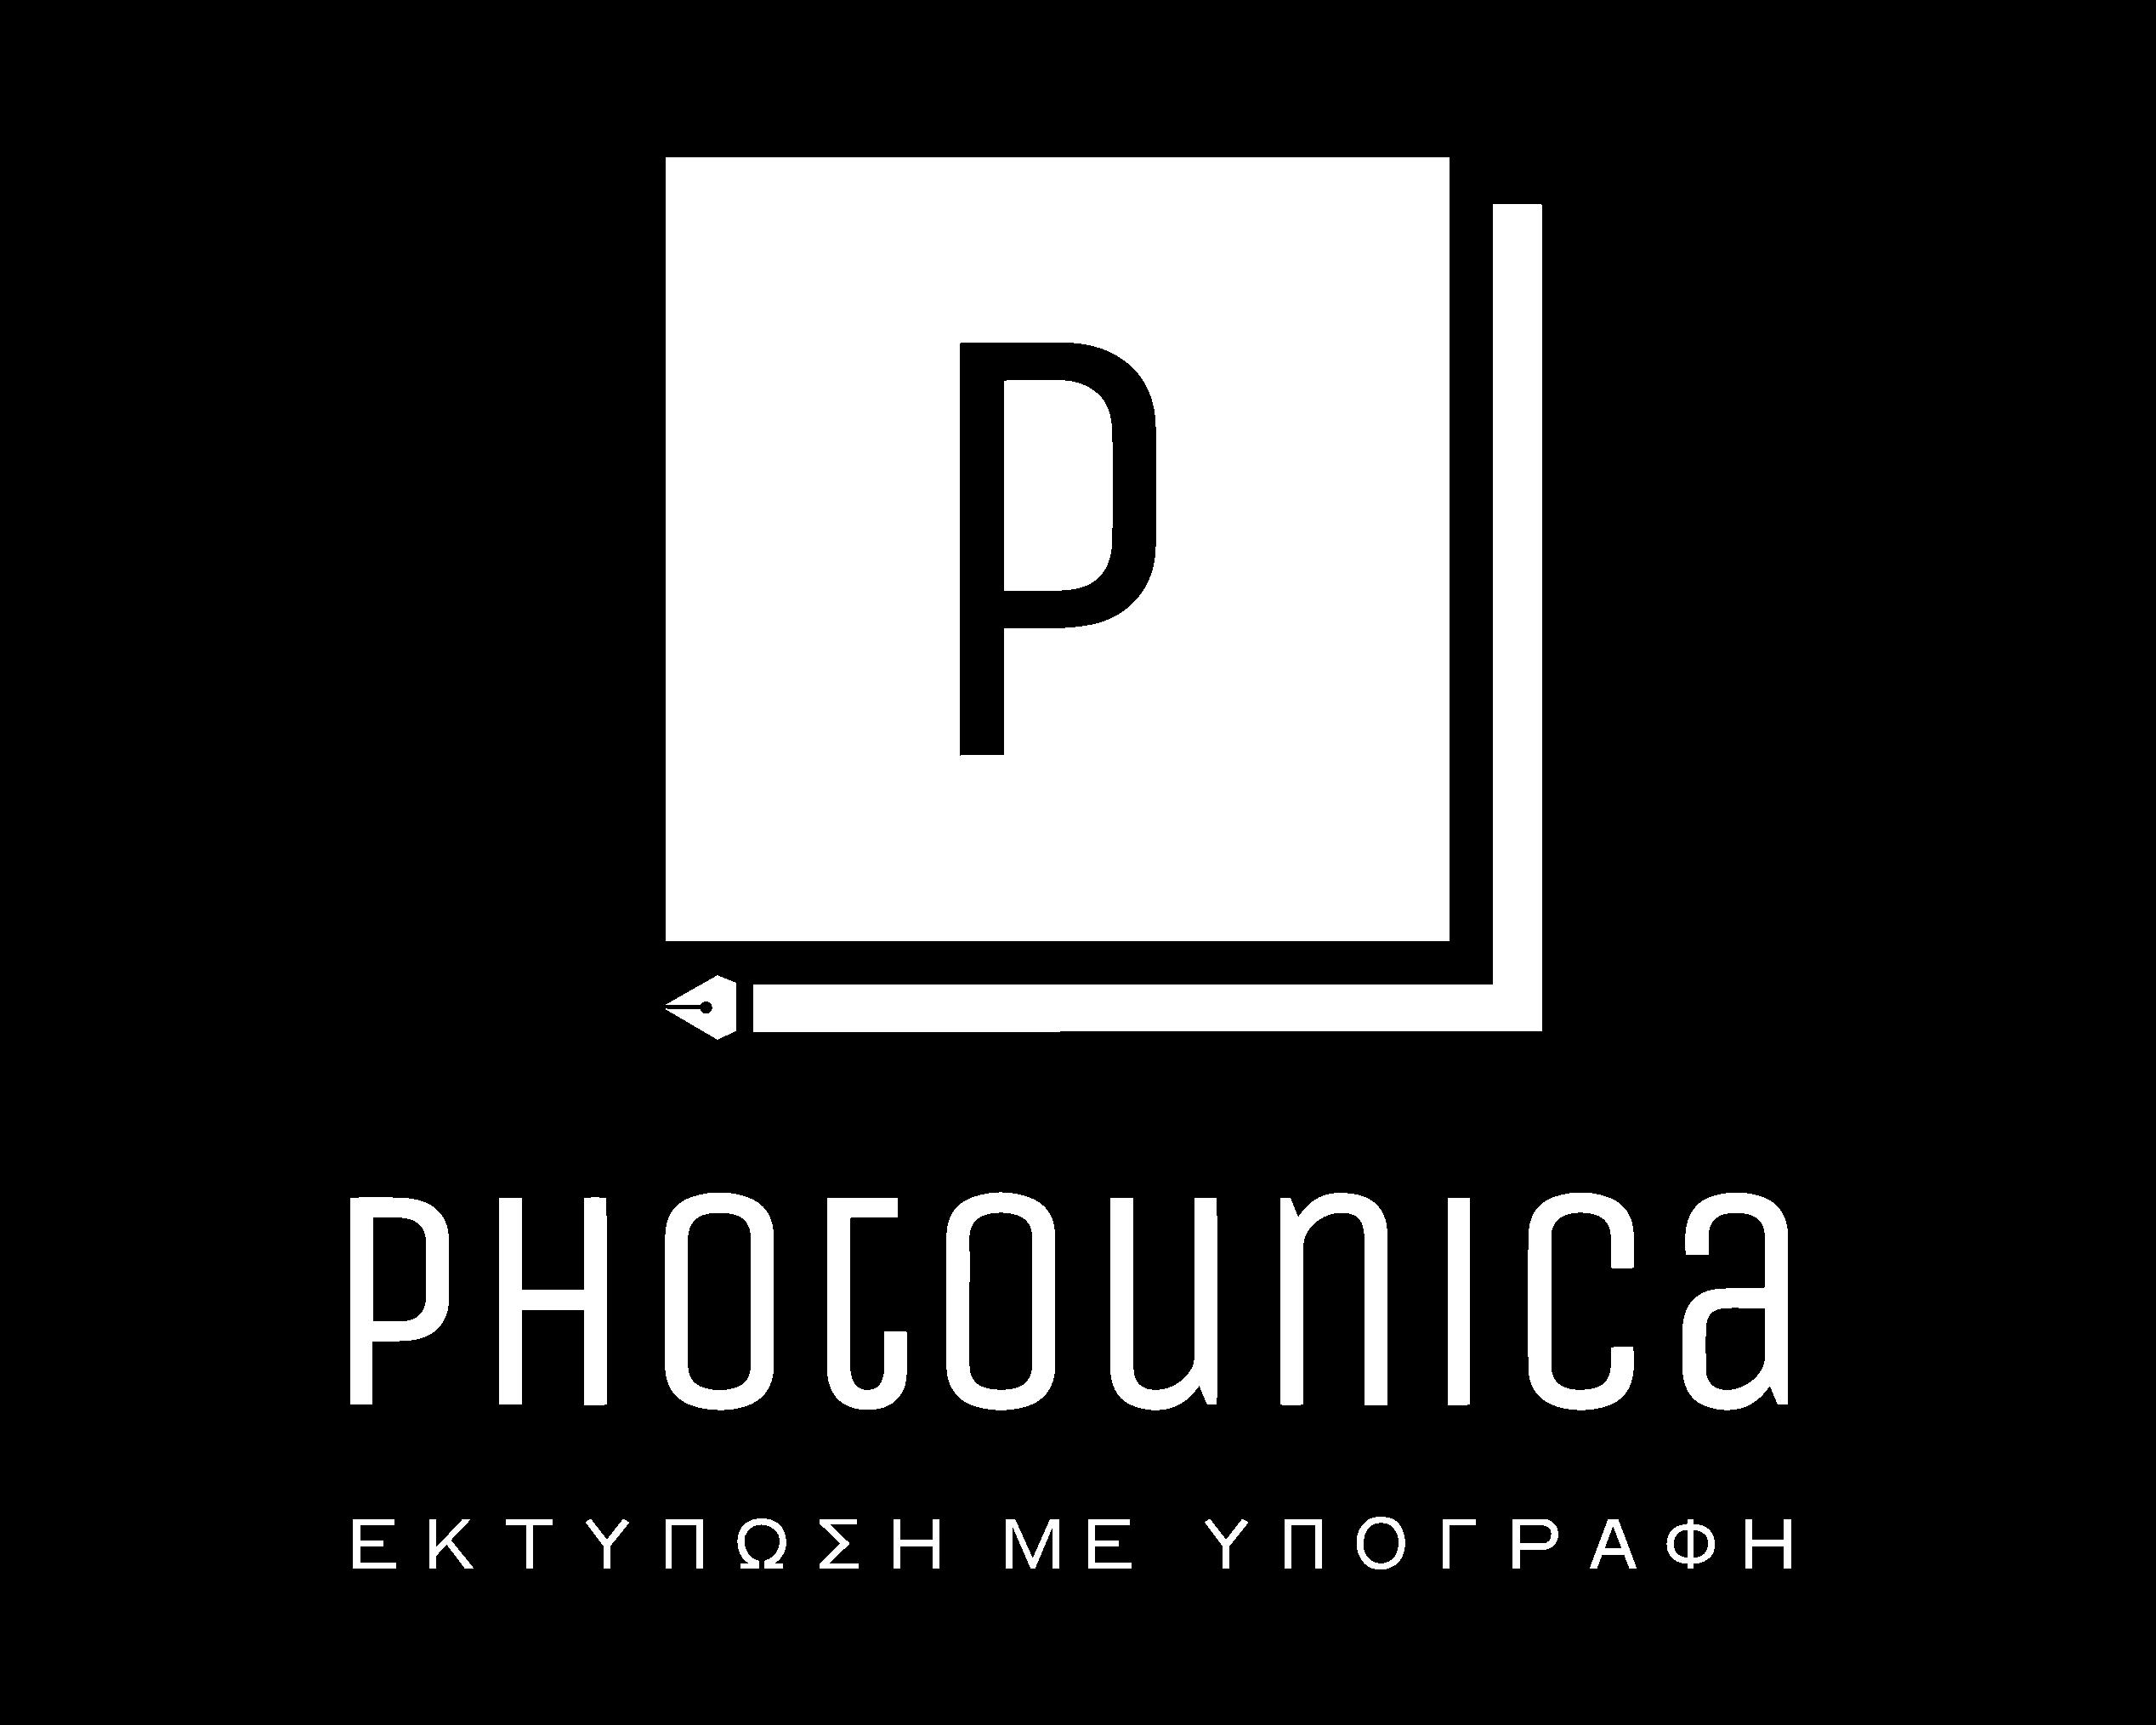 Photounica - Ποιότητα και αξιοπιστία στην ψηφιακή εκτύπωση.